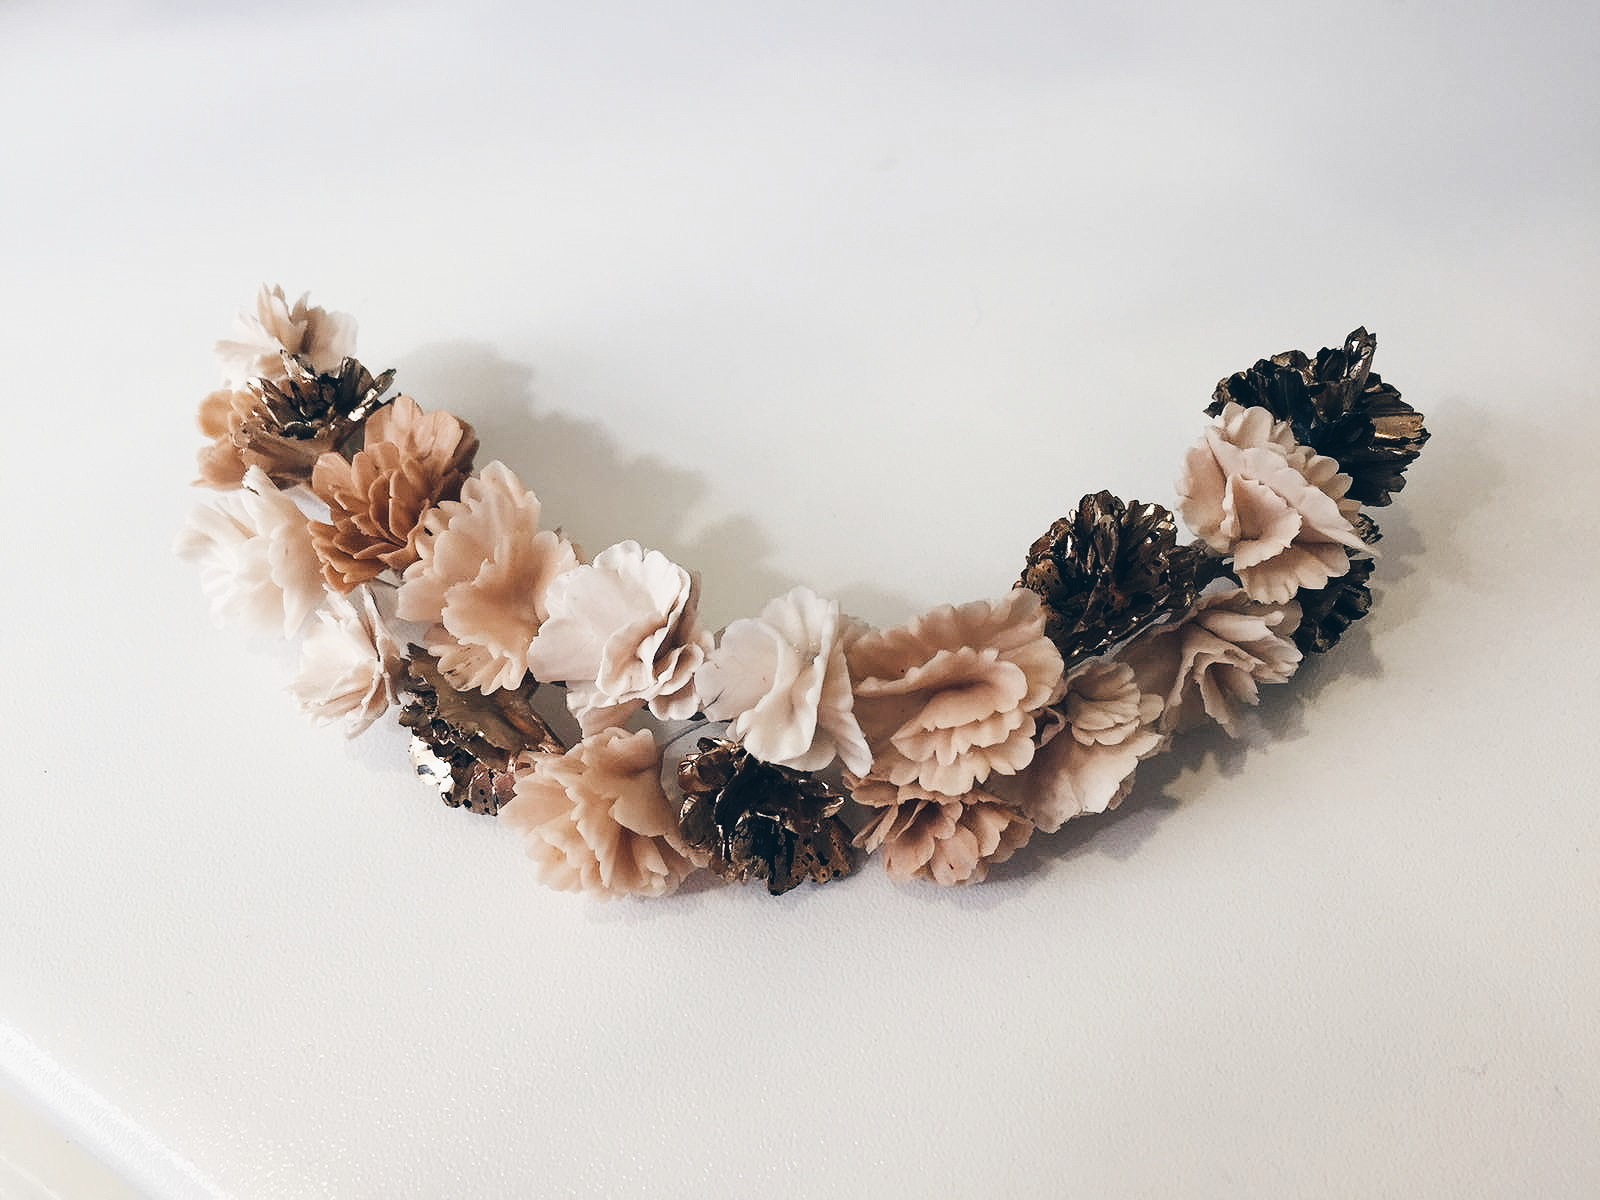 Semicorona porcelana flores (elaborada a mano)